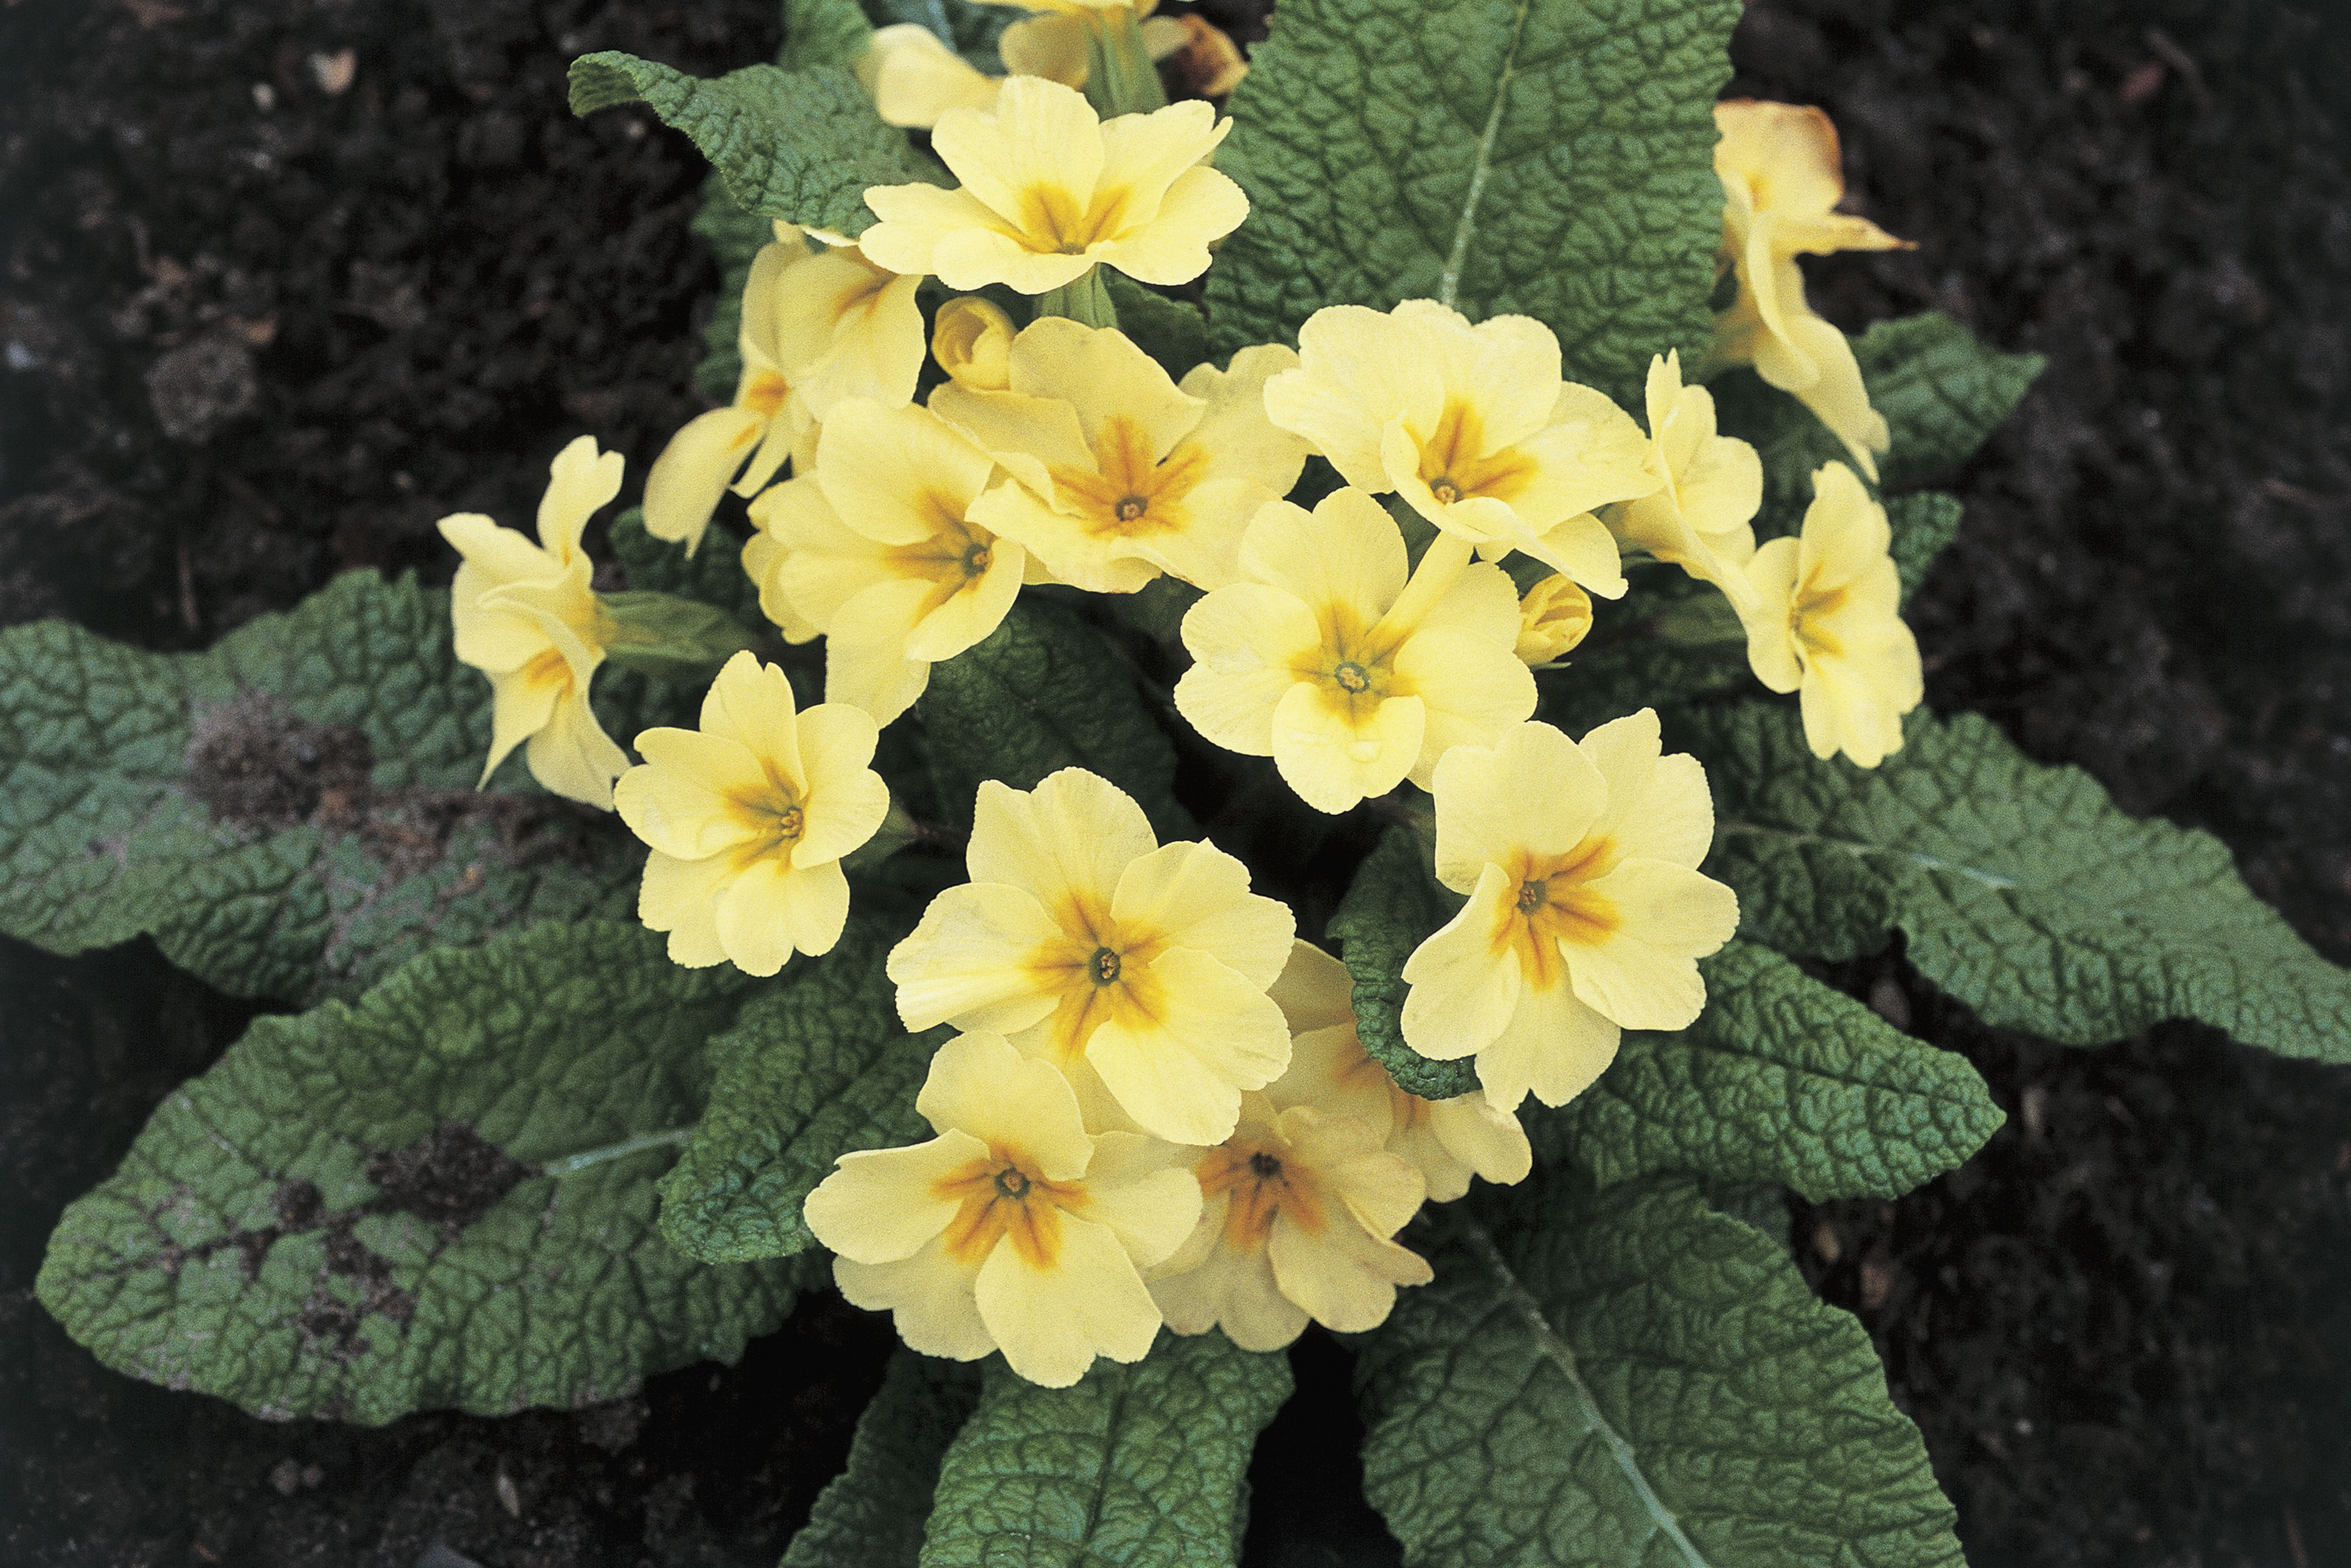 Growing Primrose Plants Indoors